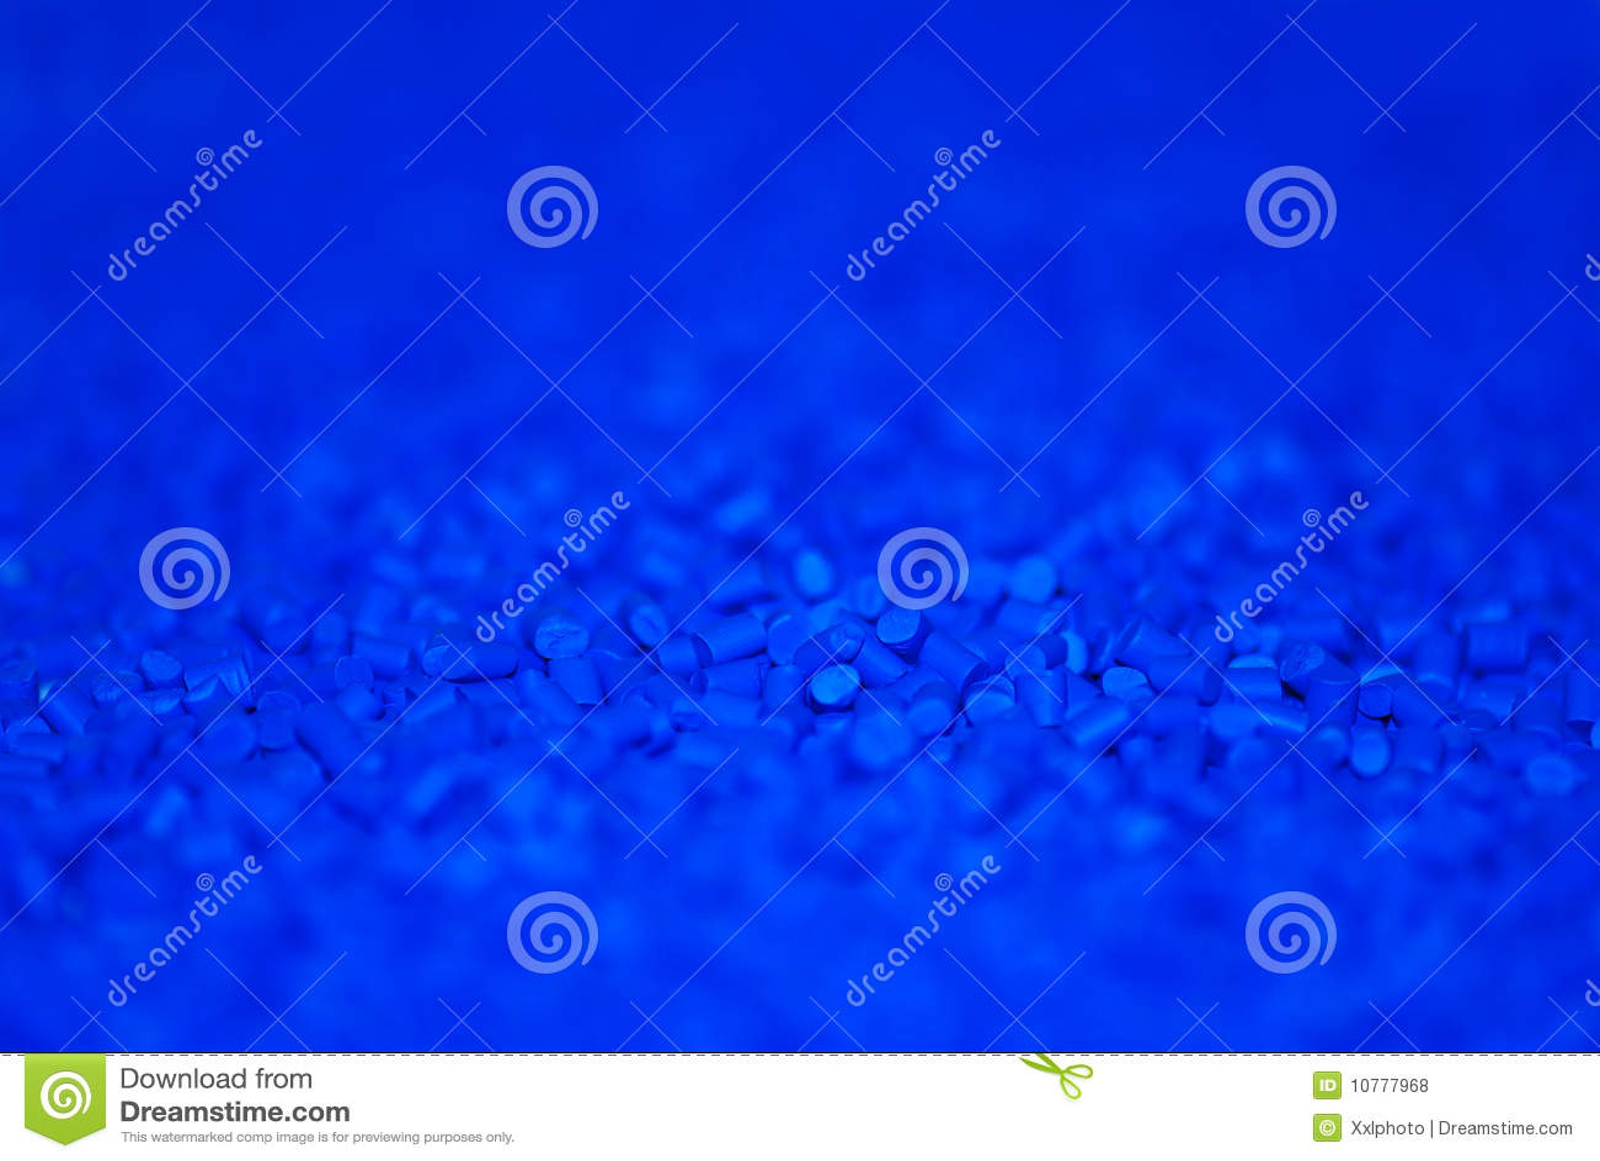 Blauwe thermoplastische hars